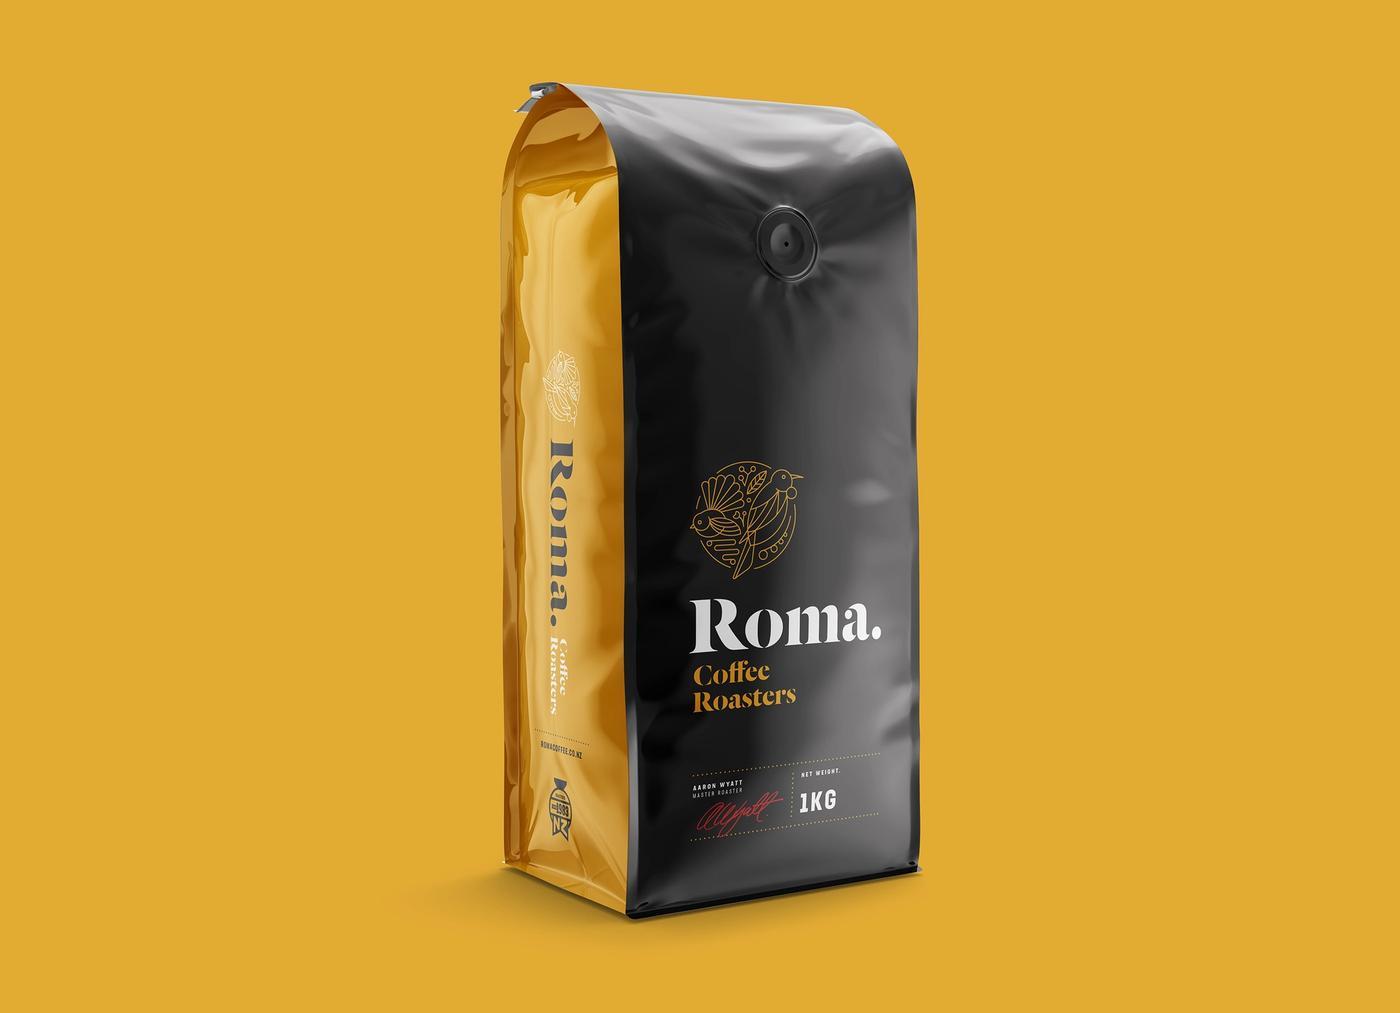 Roma Coffee Roasters